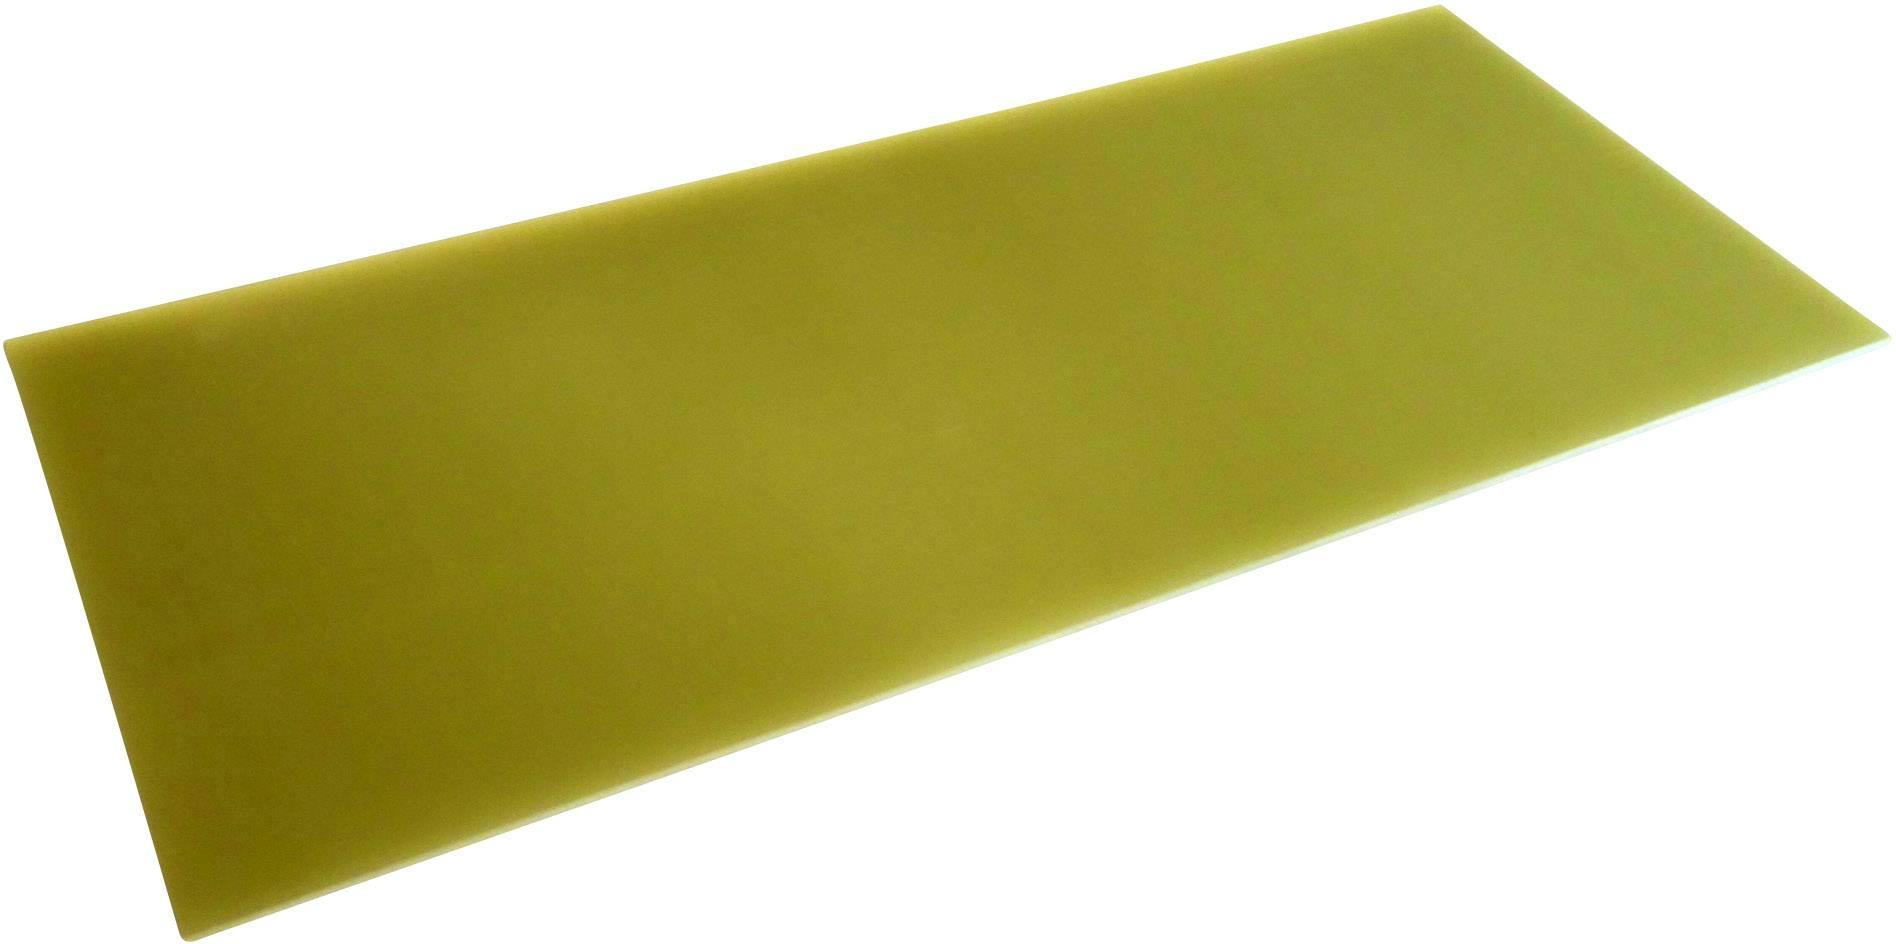 Epoxidová deska Carbotex 150 x350 x 1,5 mm